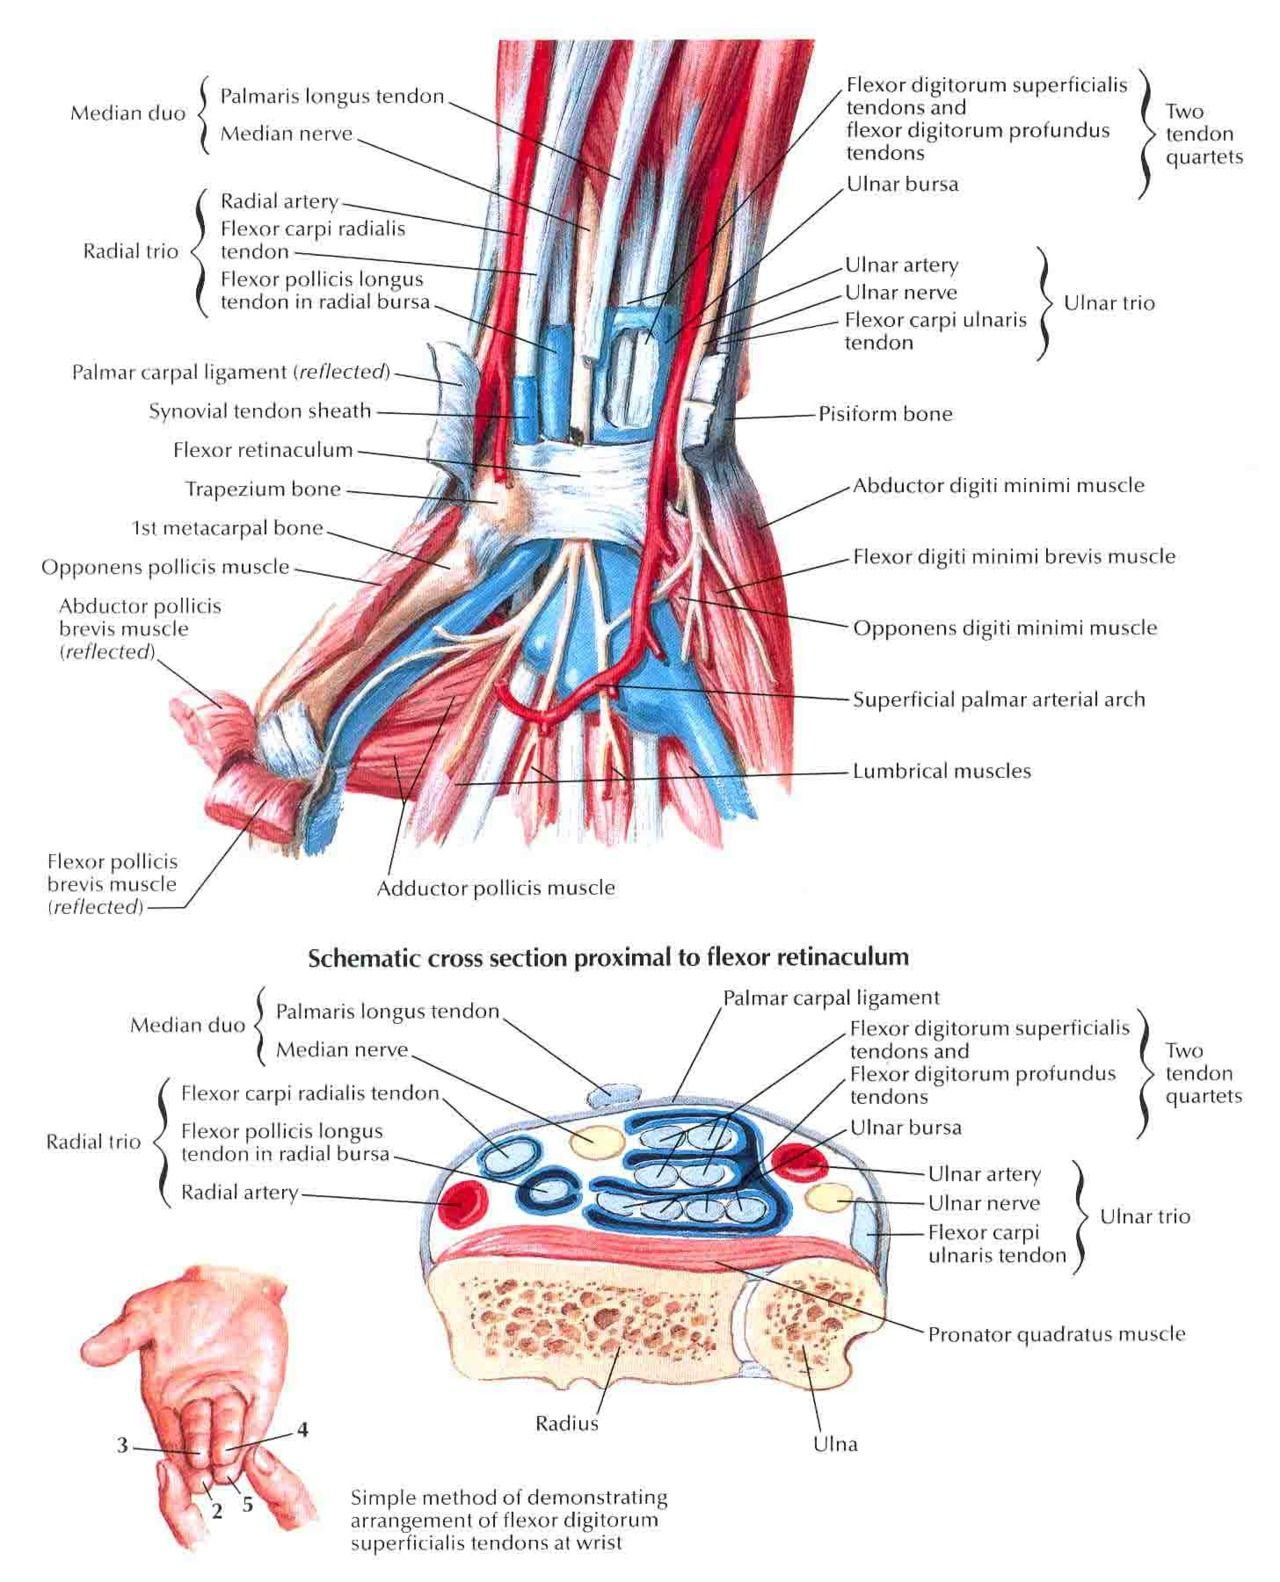 Anatomy of the Wrist | Future Nurse in 2018 | Pinterest | Anatomy ...